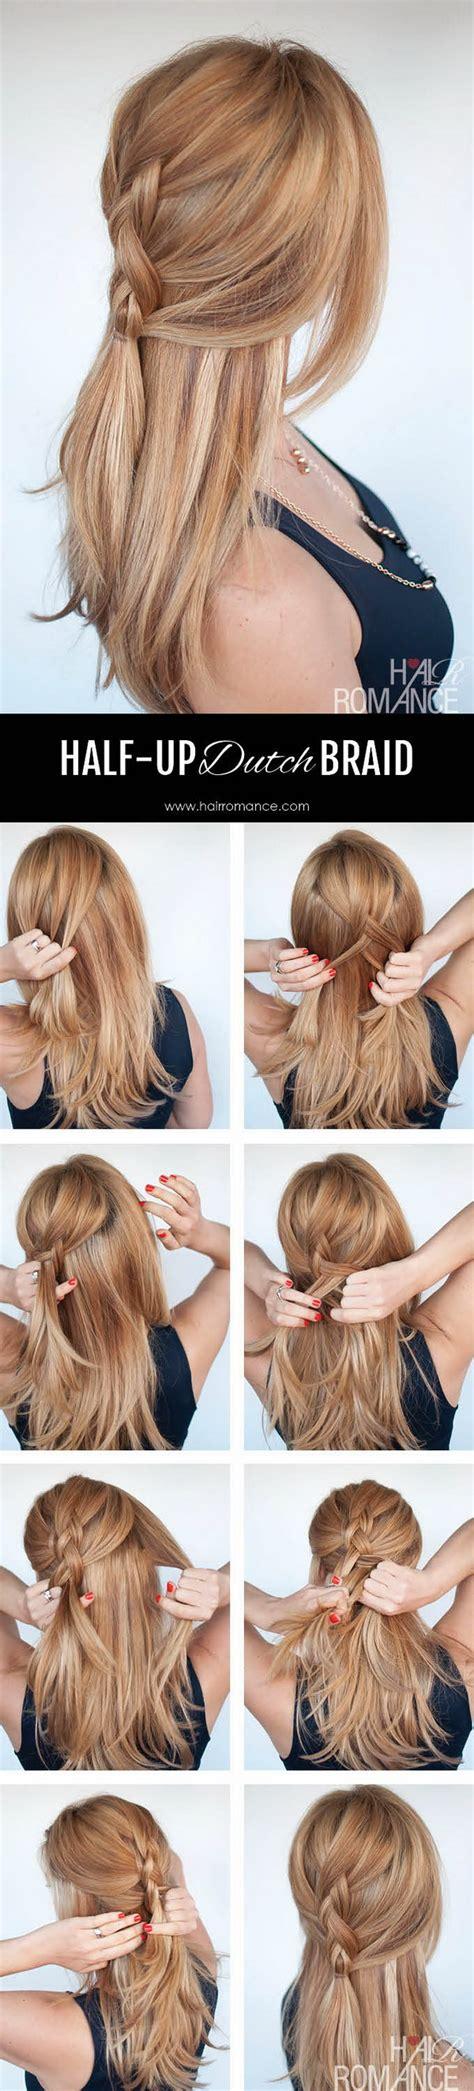 half up half down hairstyles easy step by step 55 stunning half up half down hairstyles